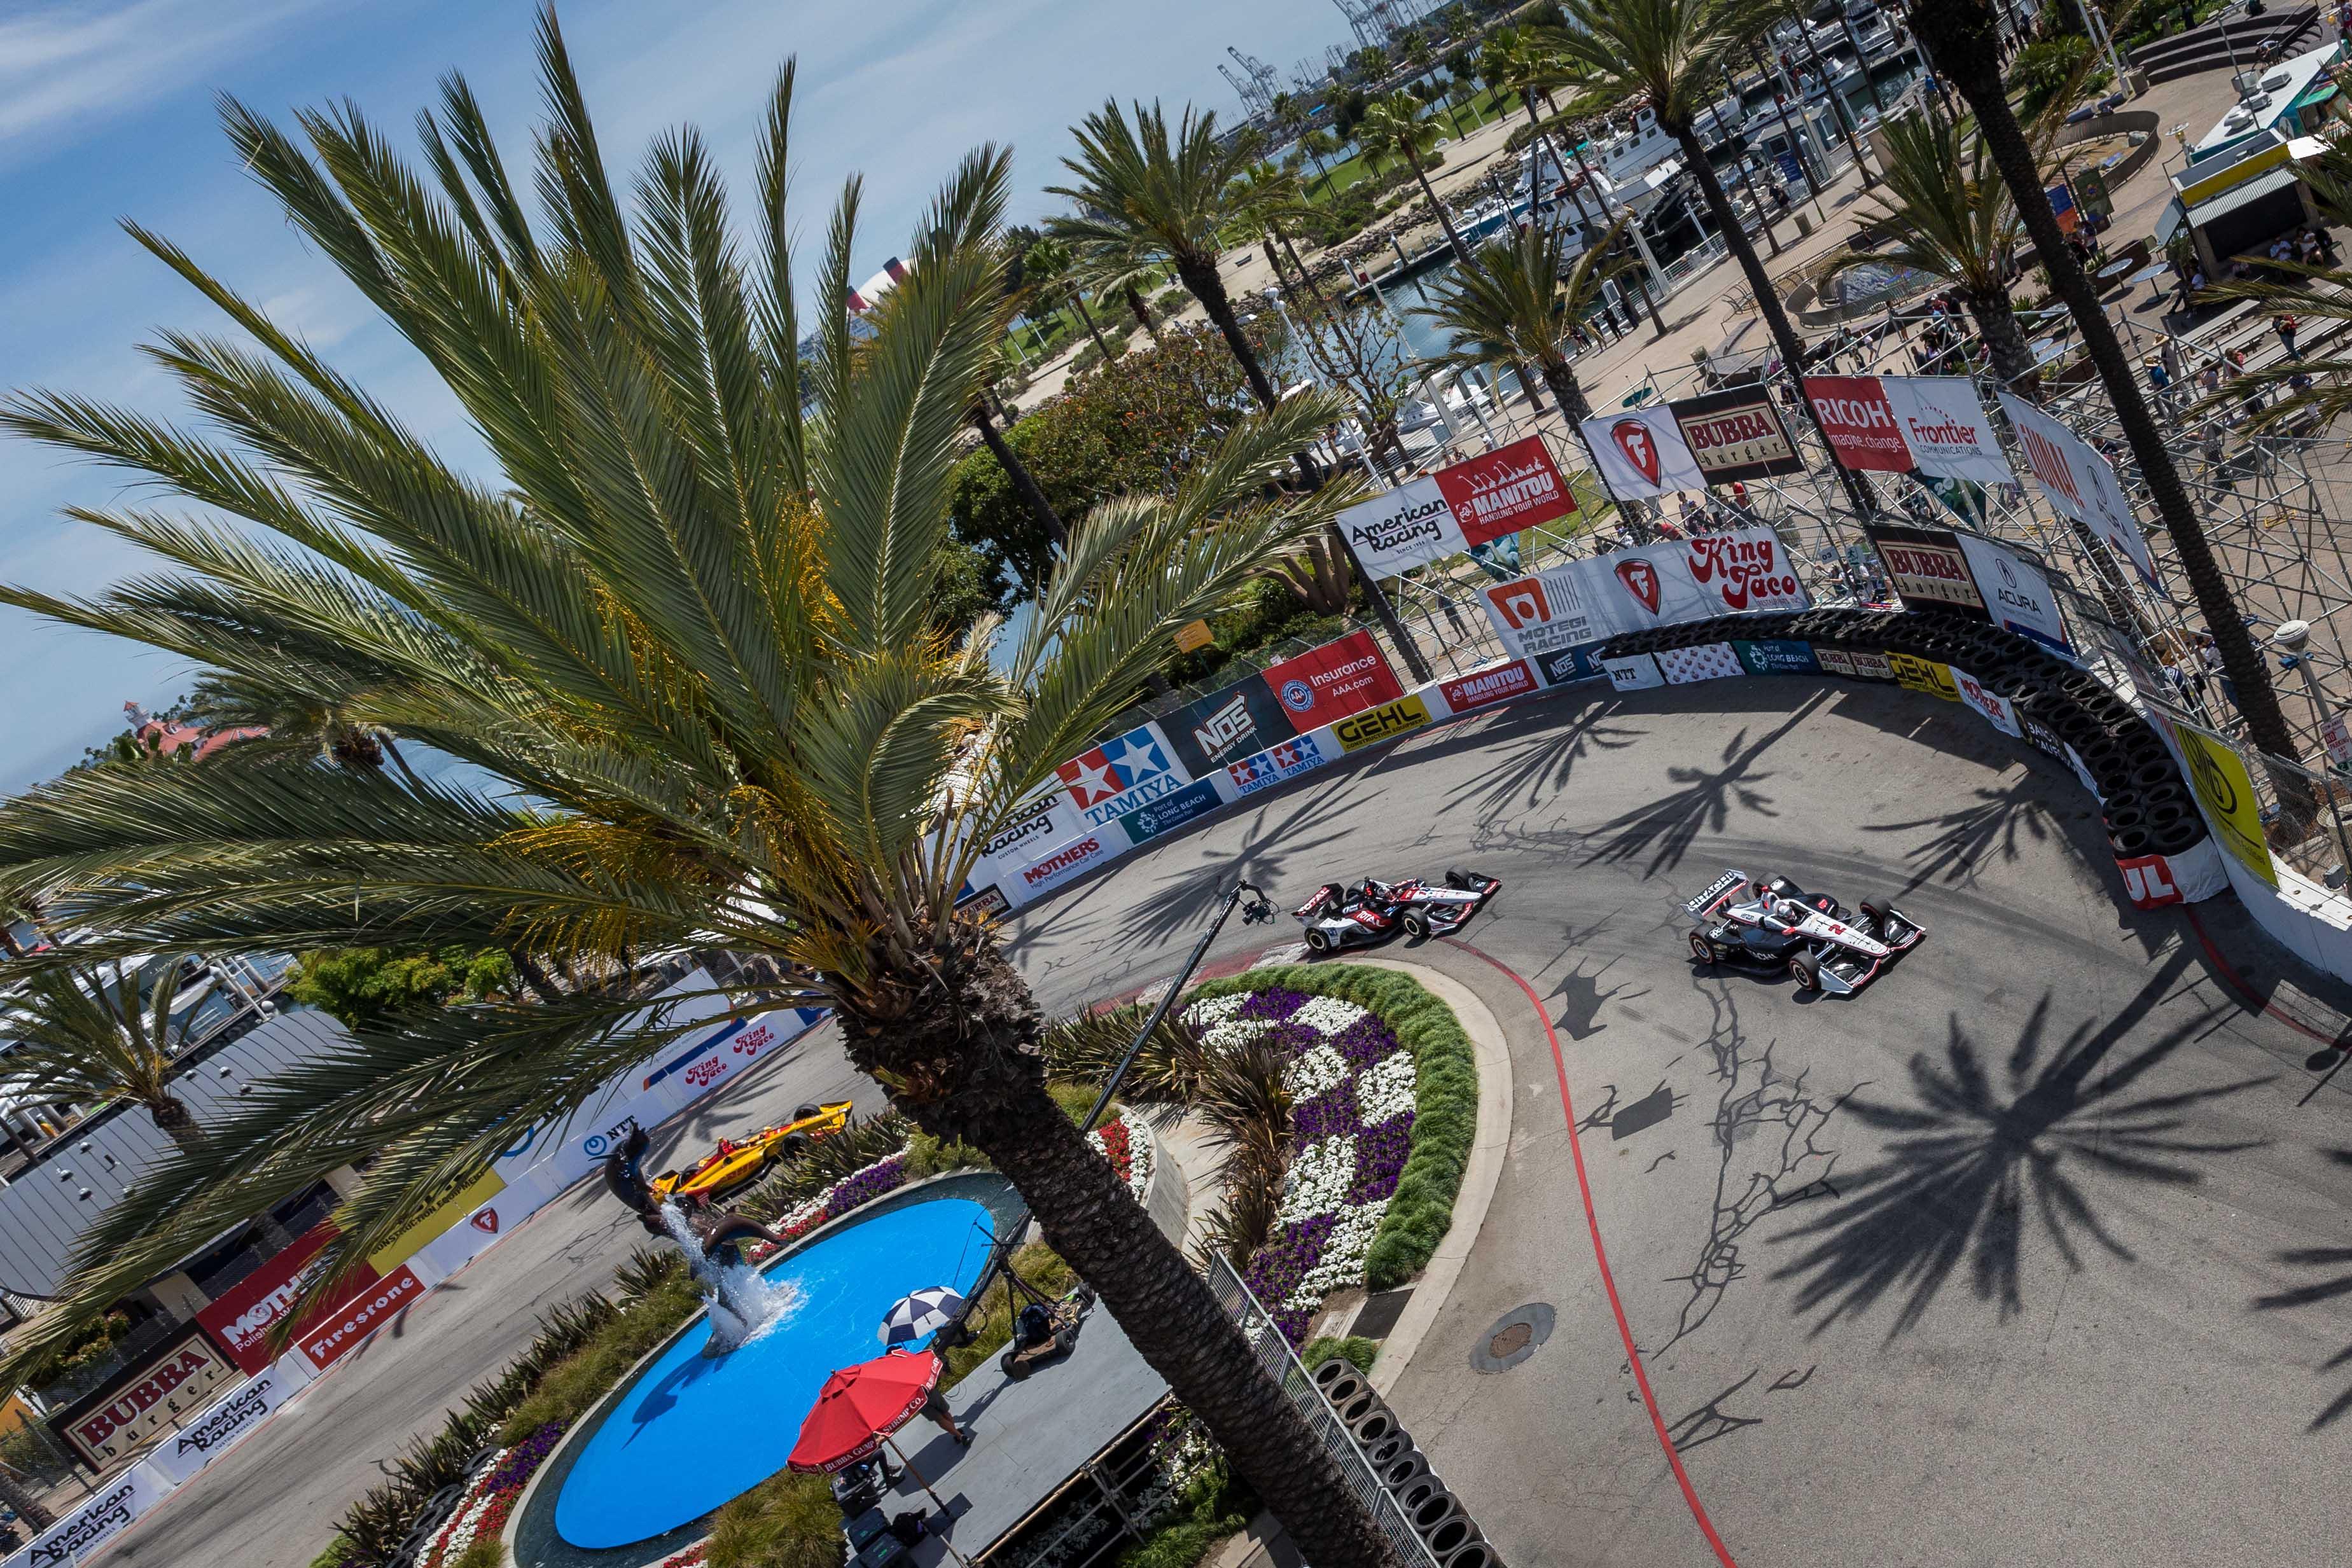 Grand Prix of Long Beach - Indycar Series - Fountain